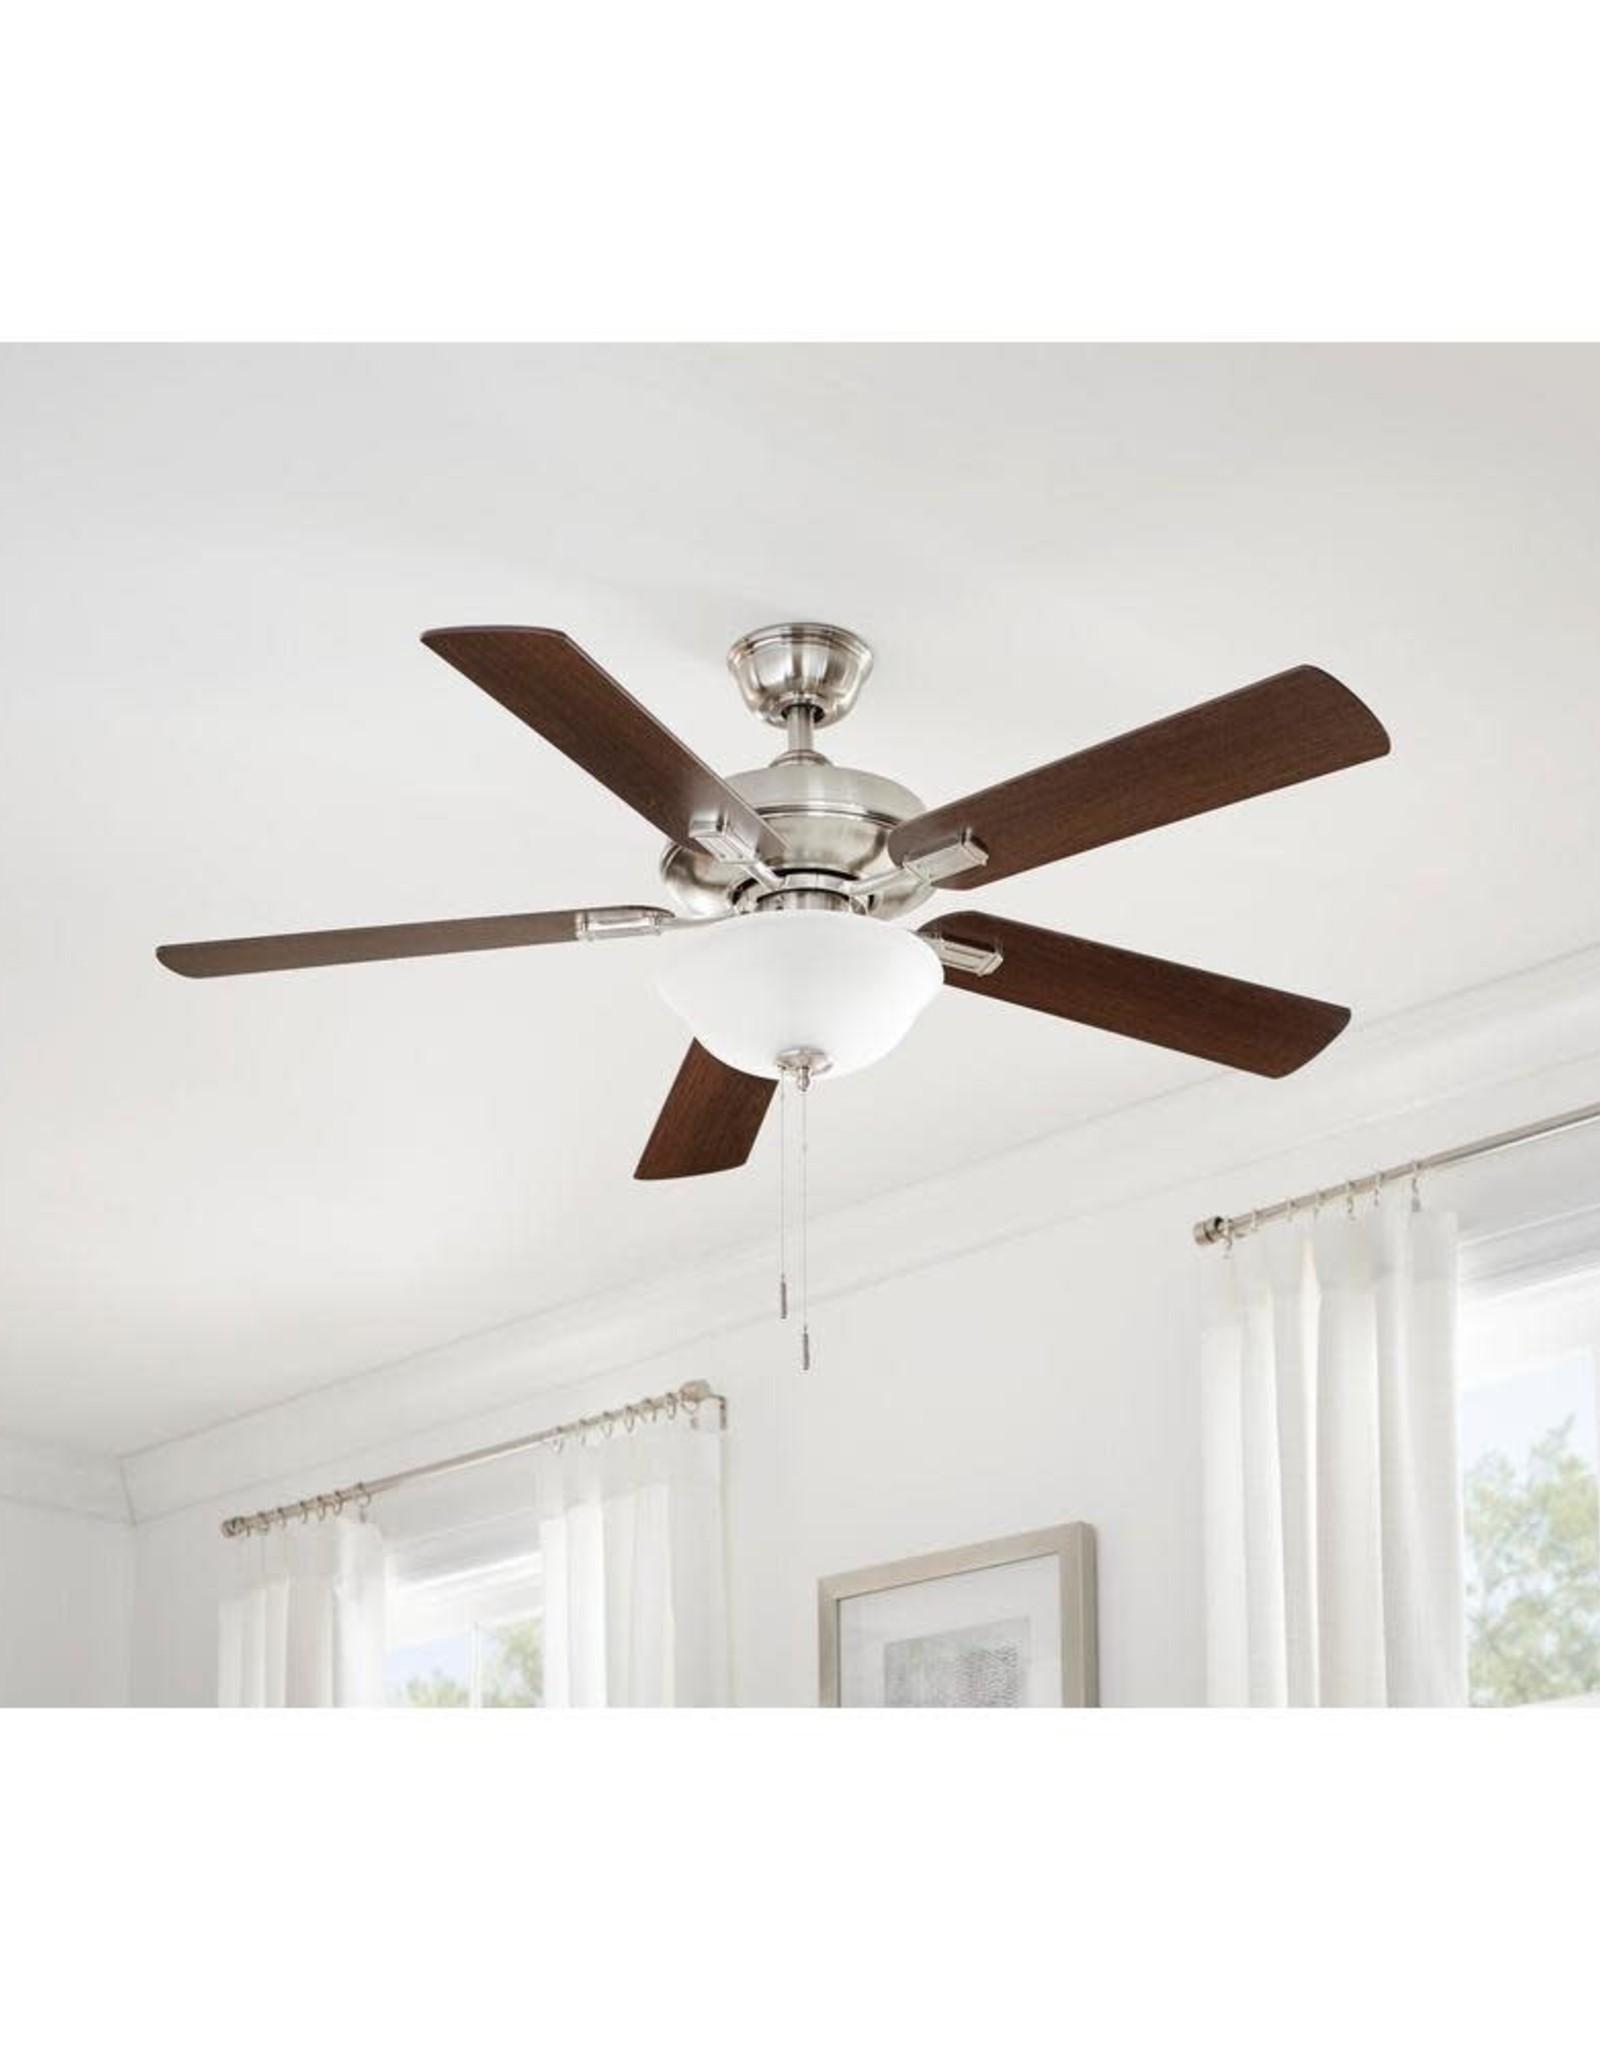 Hampton Bay Larson 52 in. LED Brushed Nickel Ceiling Fan With Light Kit